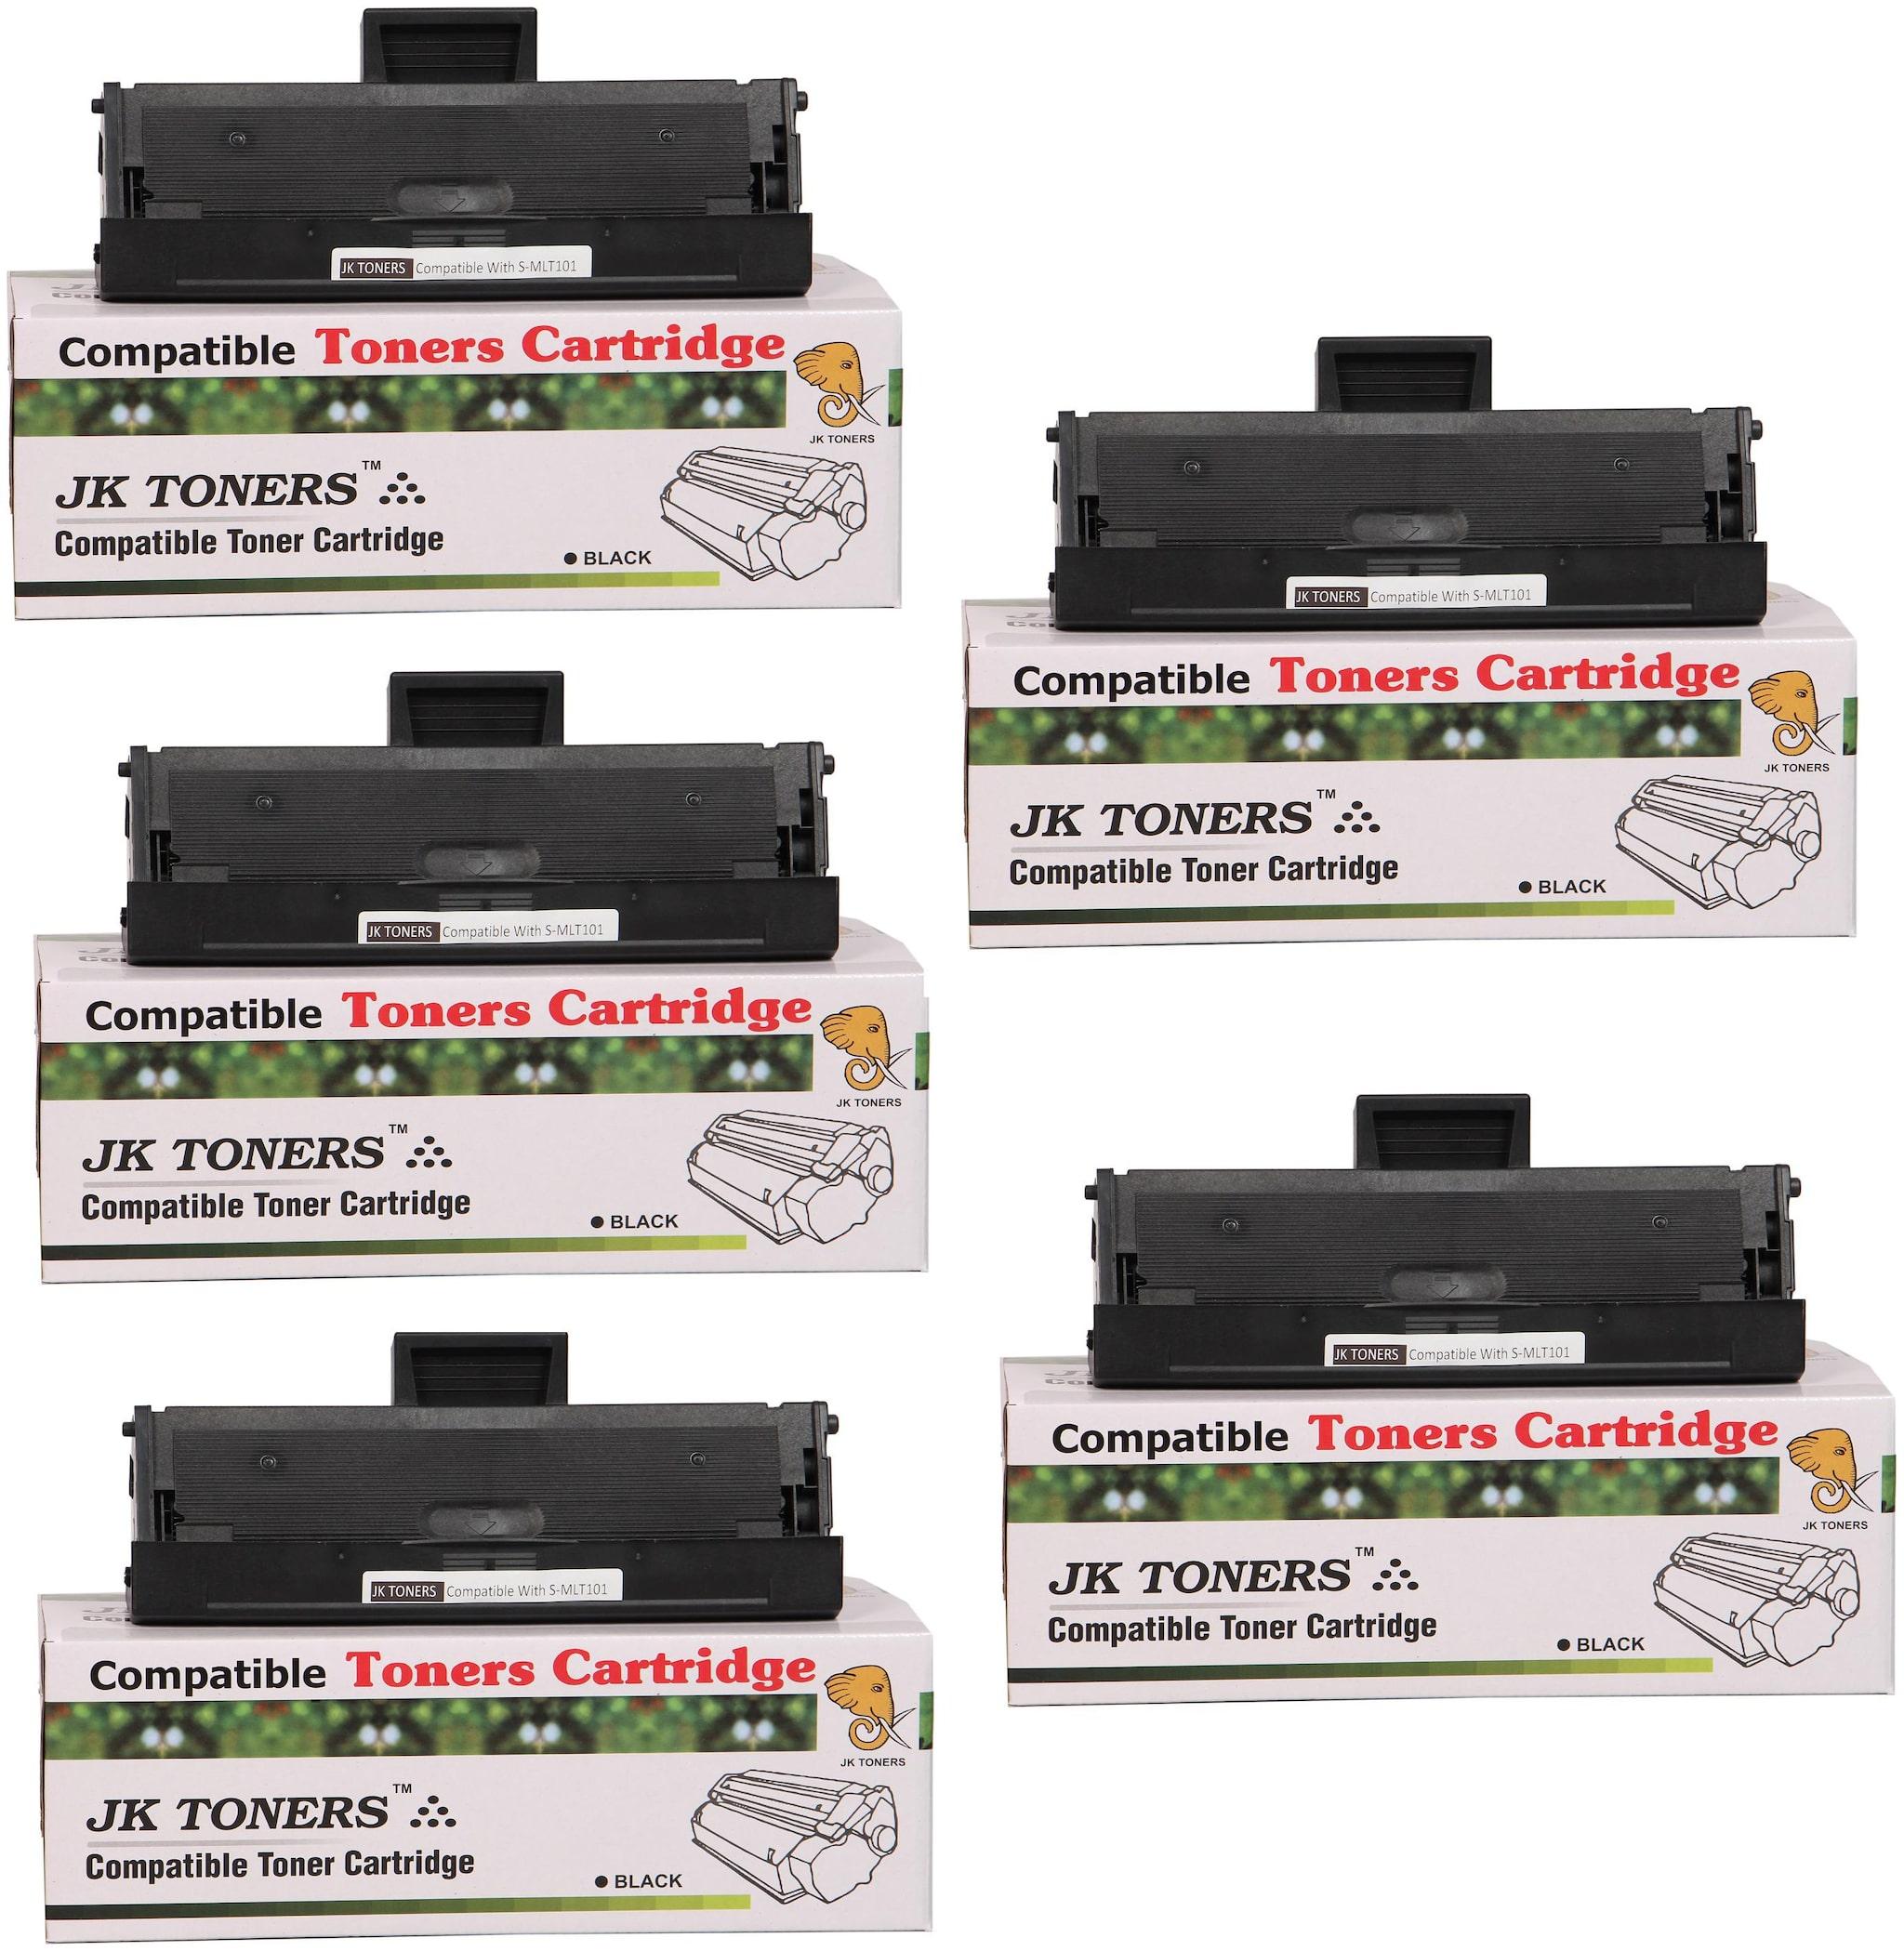 JK Toners 101 Toner Cartridge Compatible For Samsung Series  Black   Pack of 5